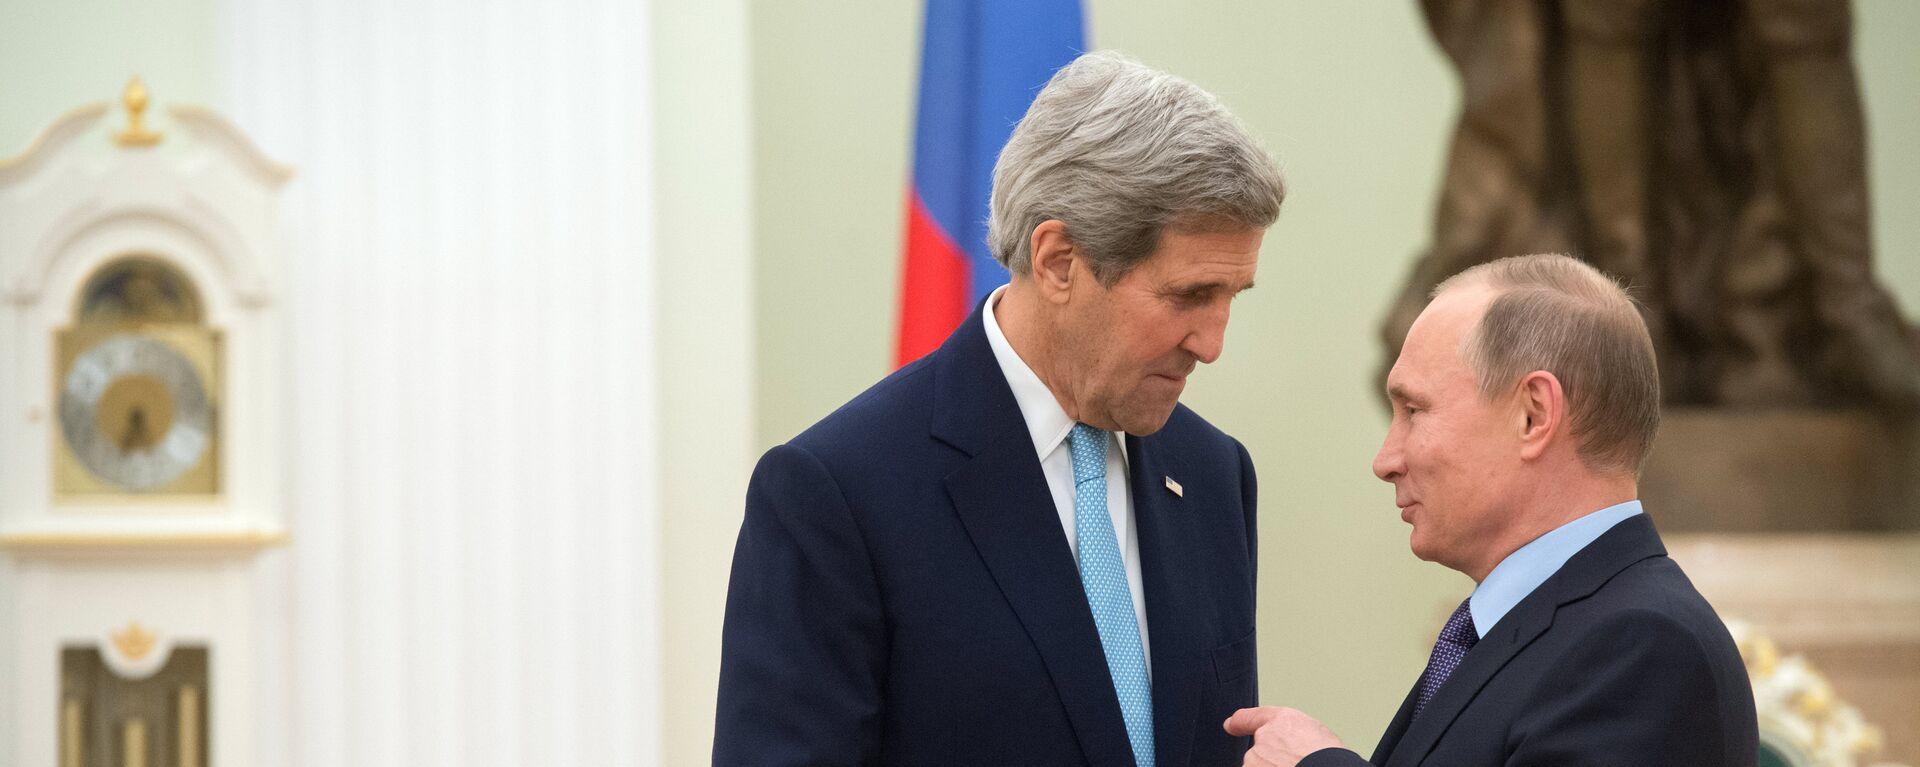 Vladimir Putin a John Kerry - Sputnik Česká republika, 1920, 14.07.2021